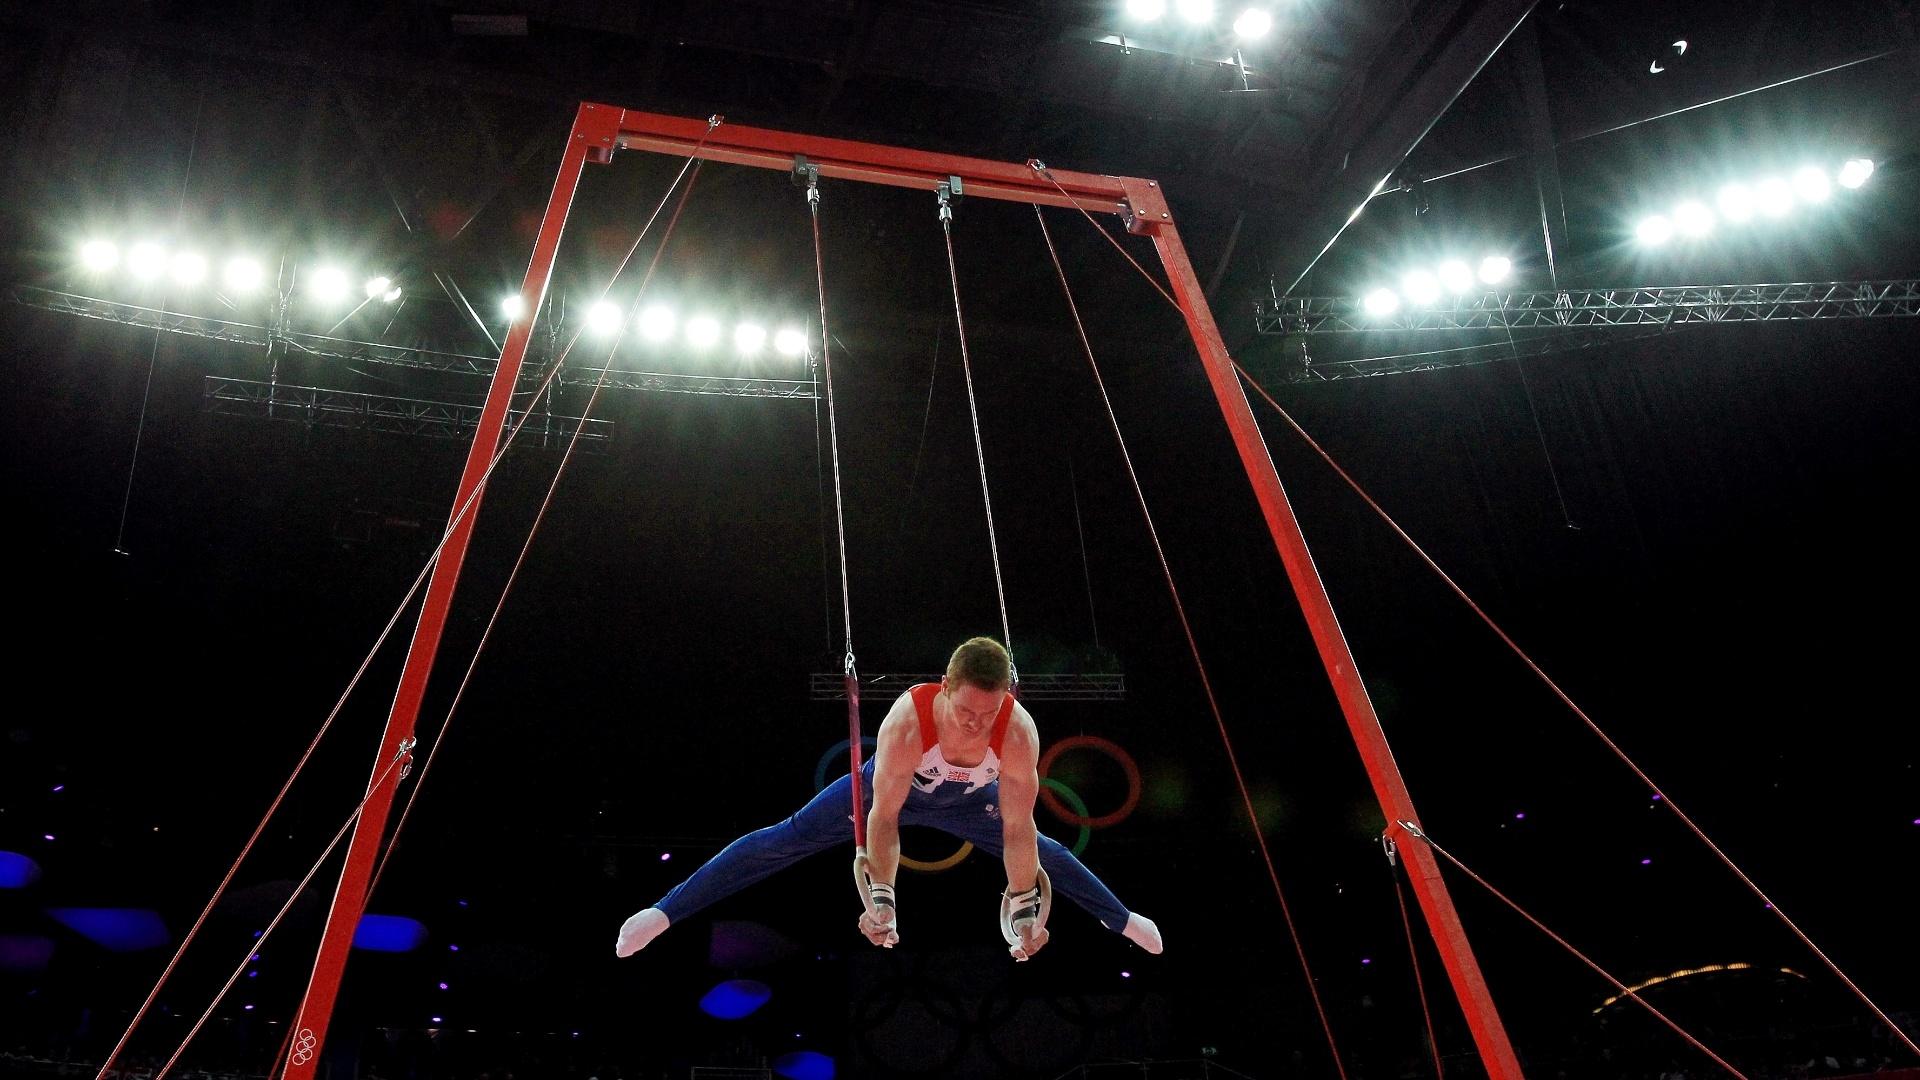 Britânico Daniel Purvis se apresenta nas argolas durante a final de individual geral da ginástica artística